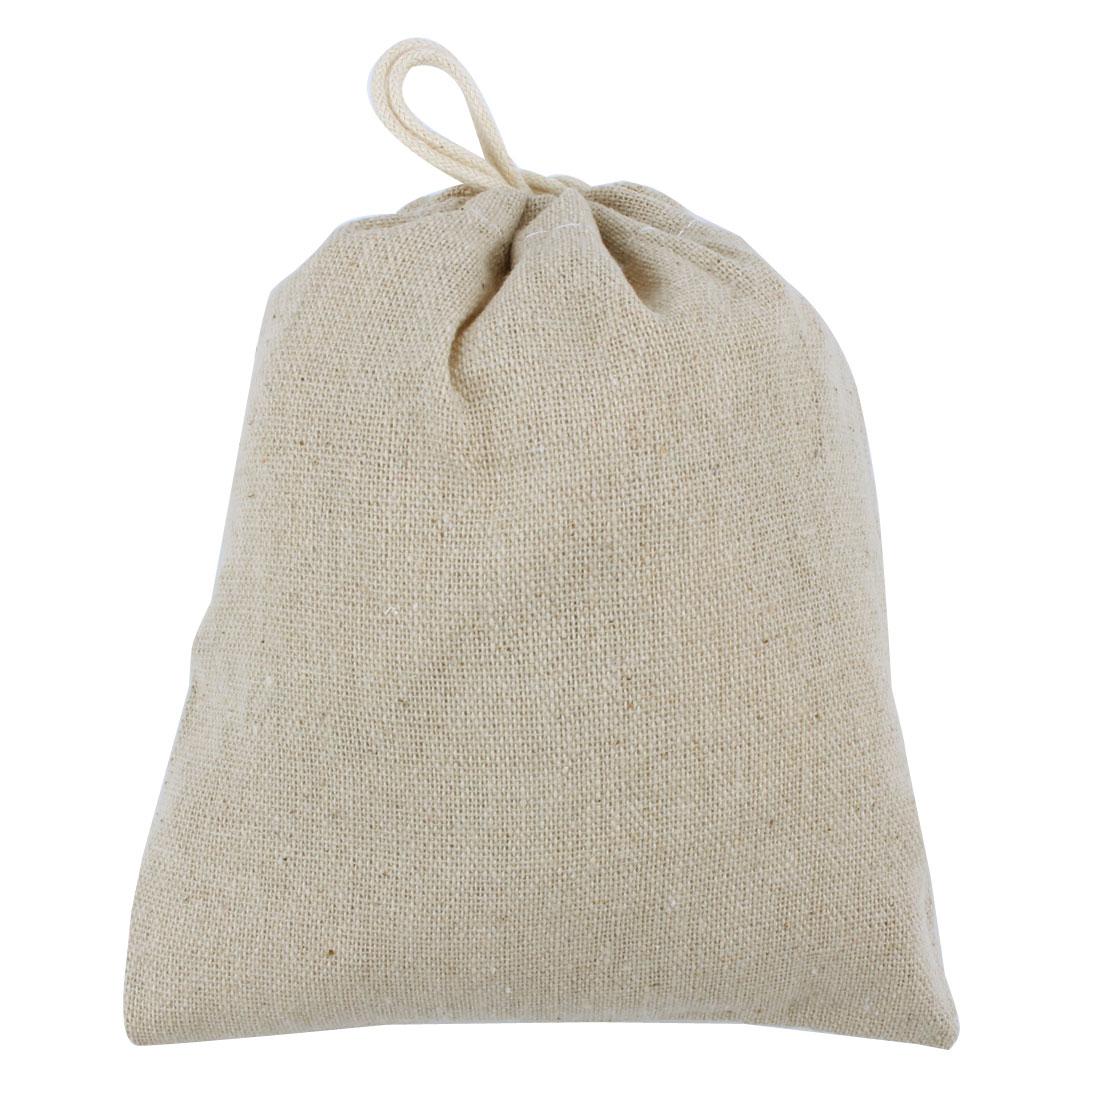 Home Outdoor Cotton Linen Drawstring Storage Pouch Holder Gift Bag 15.5cm x 14cm